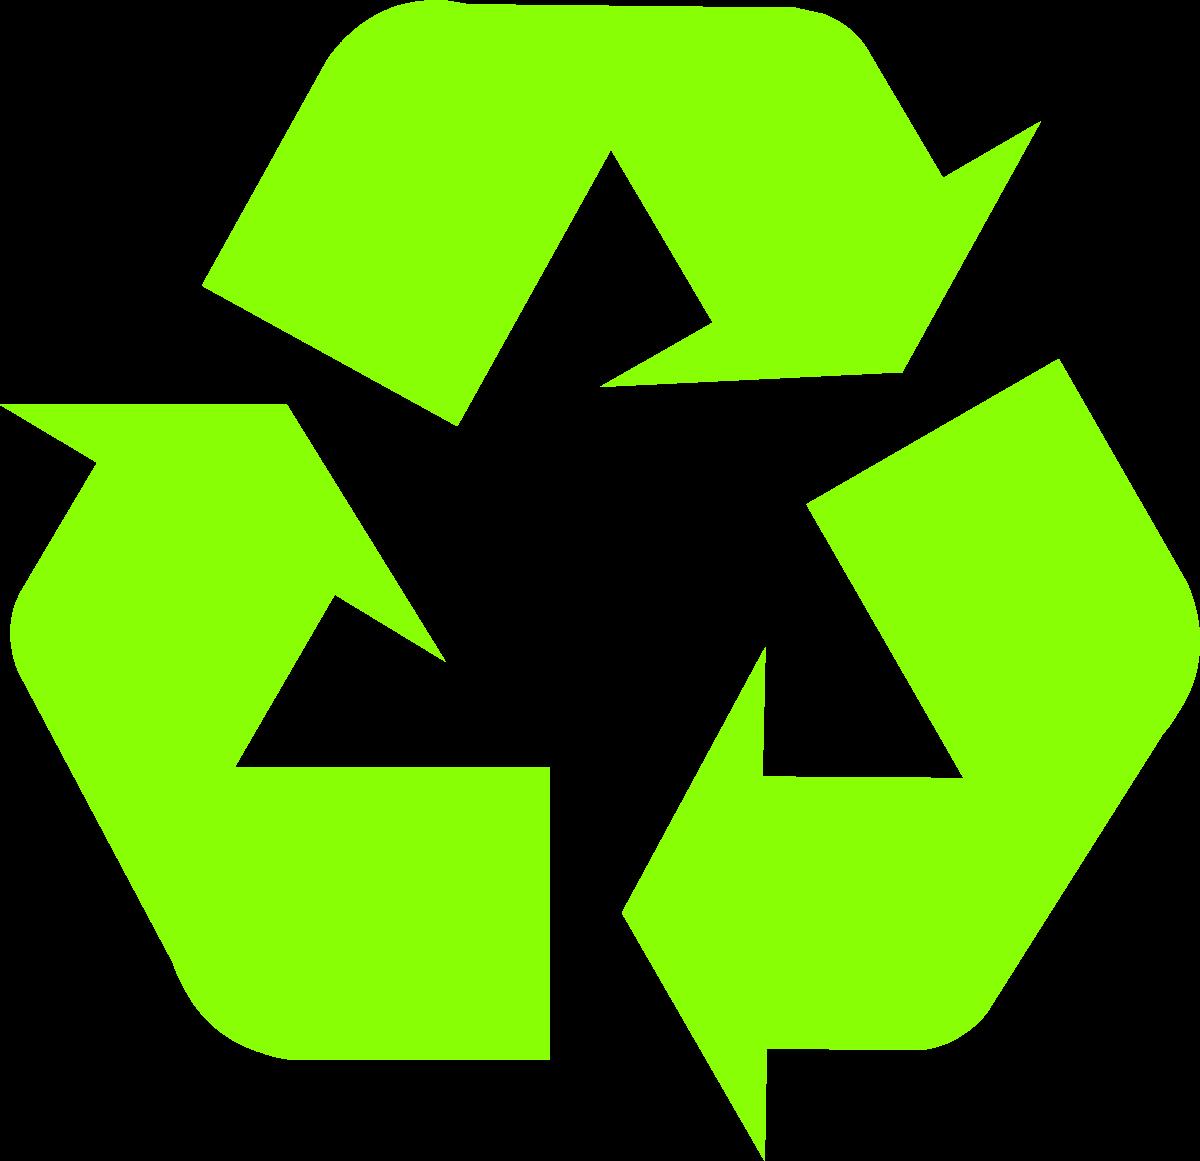 Light green universal recycling symbol logo sign httpwww light green universal recycling symbol logo sign http biocorpaavc